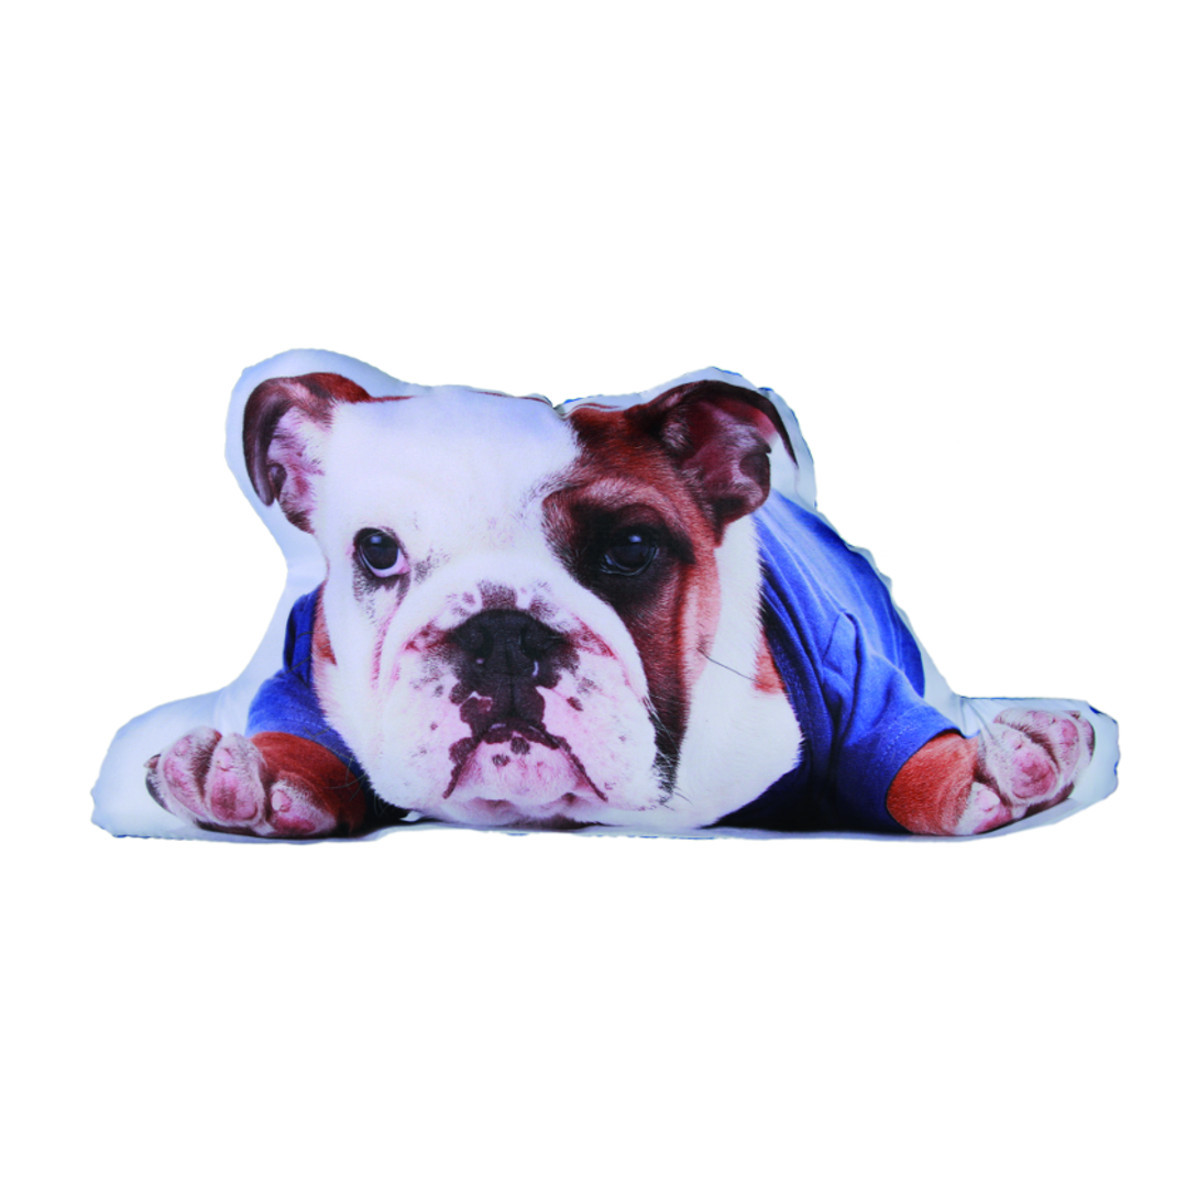 decorational cushion cat & dog